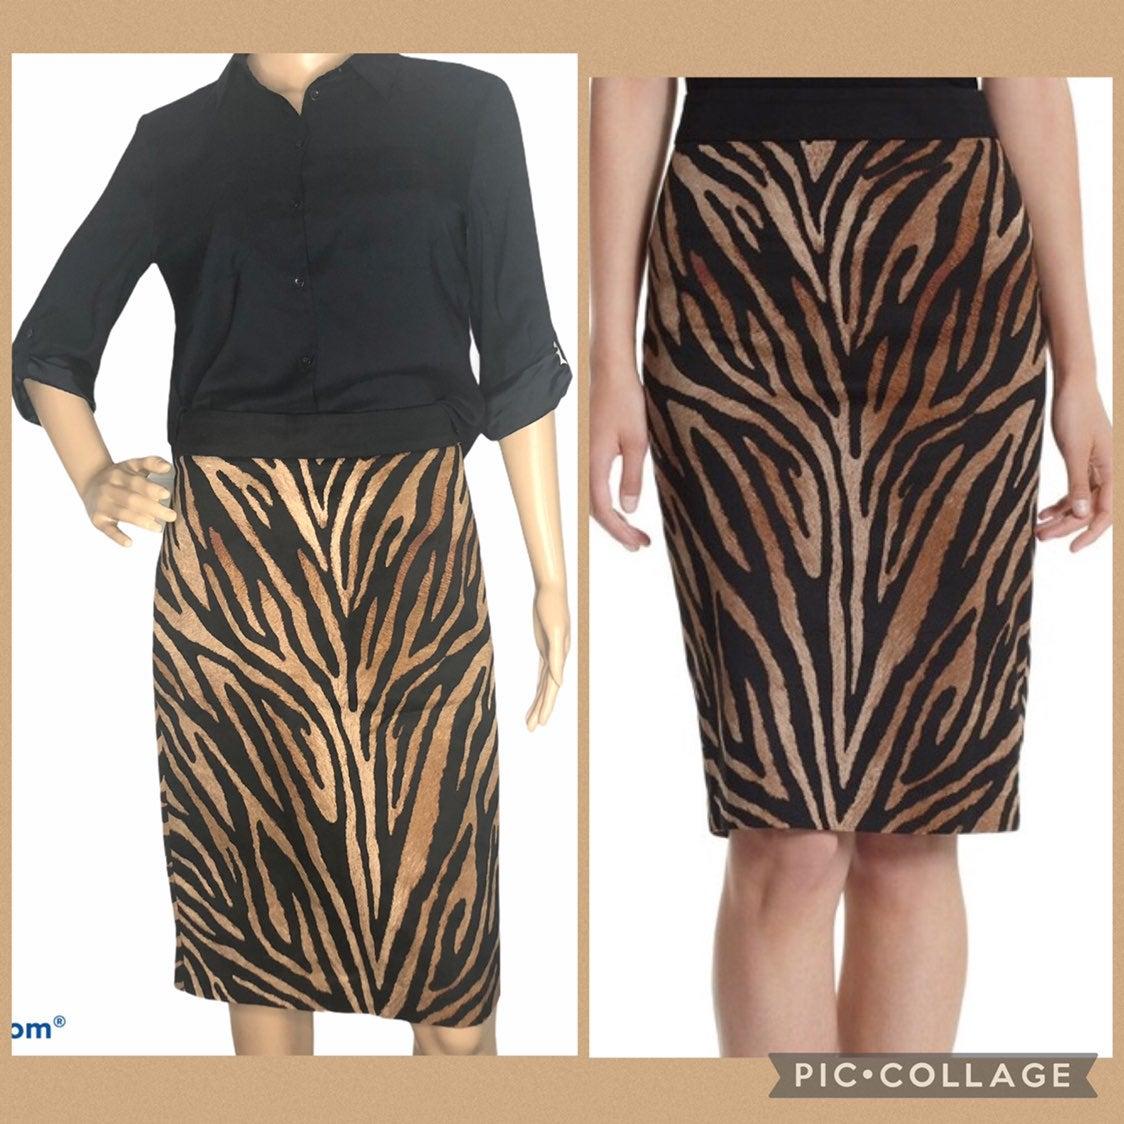 NWT WHBM animal print pencil skirt Sz 8